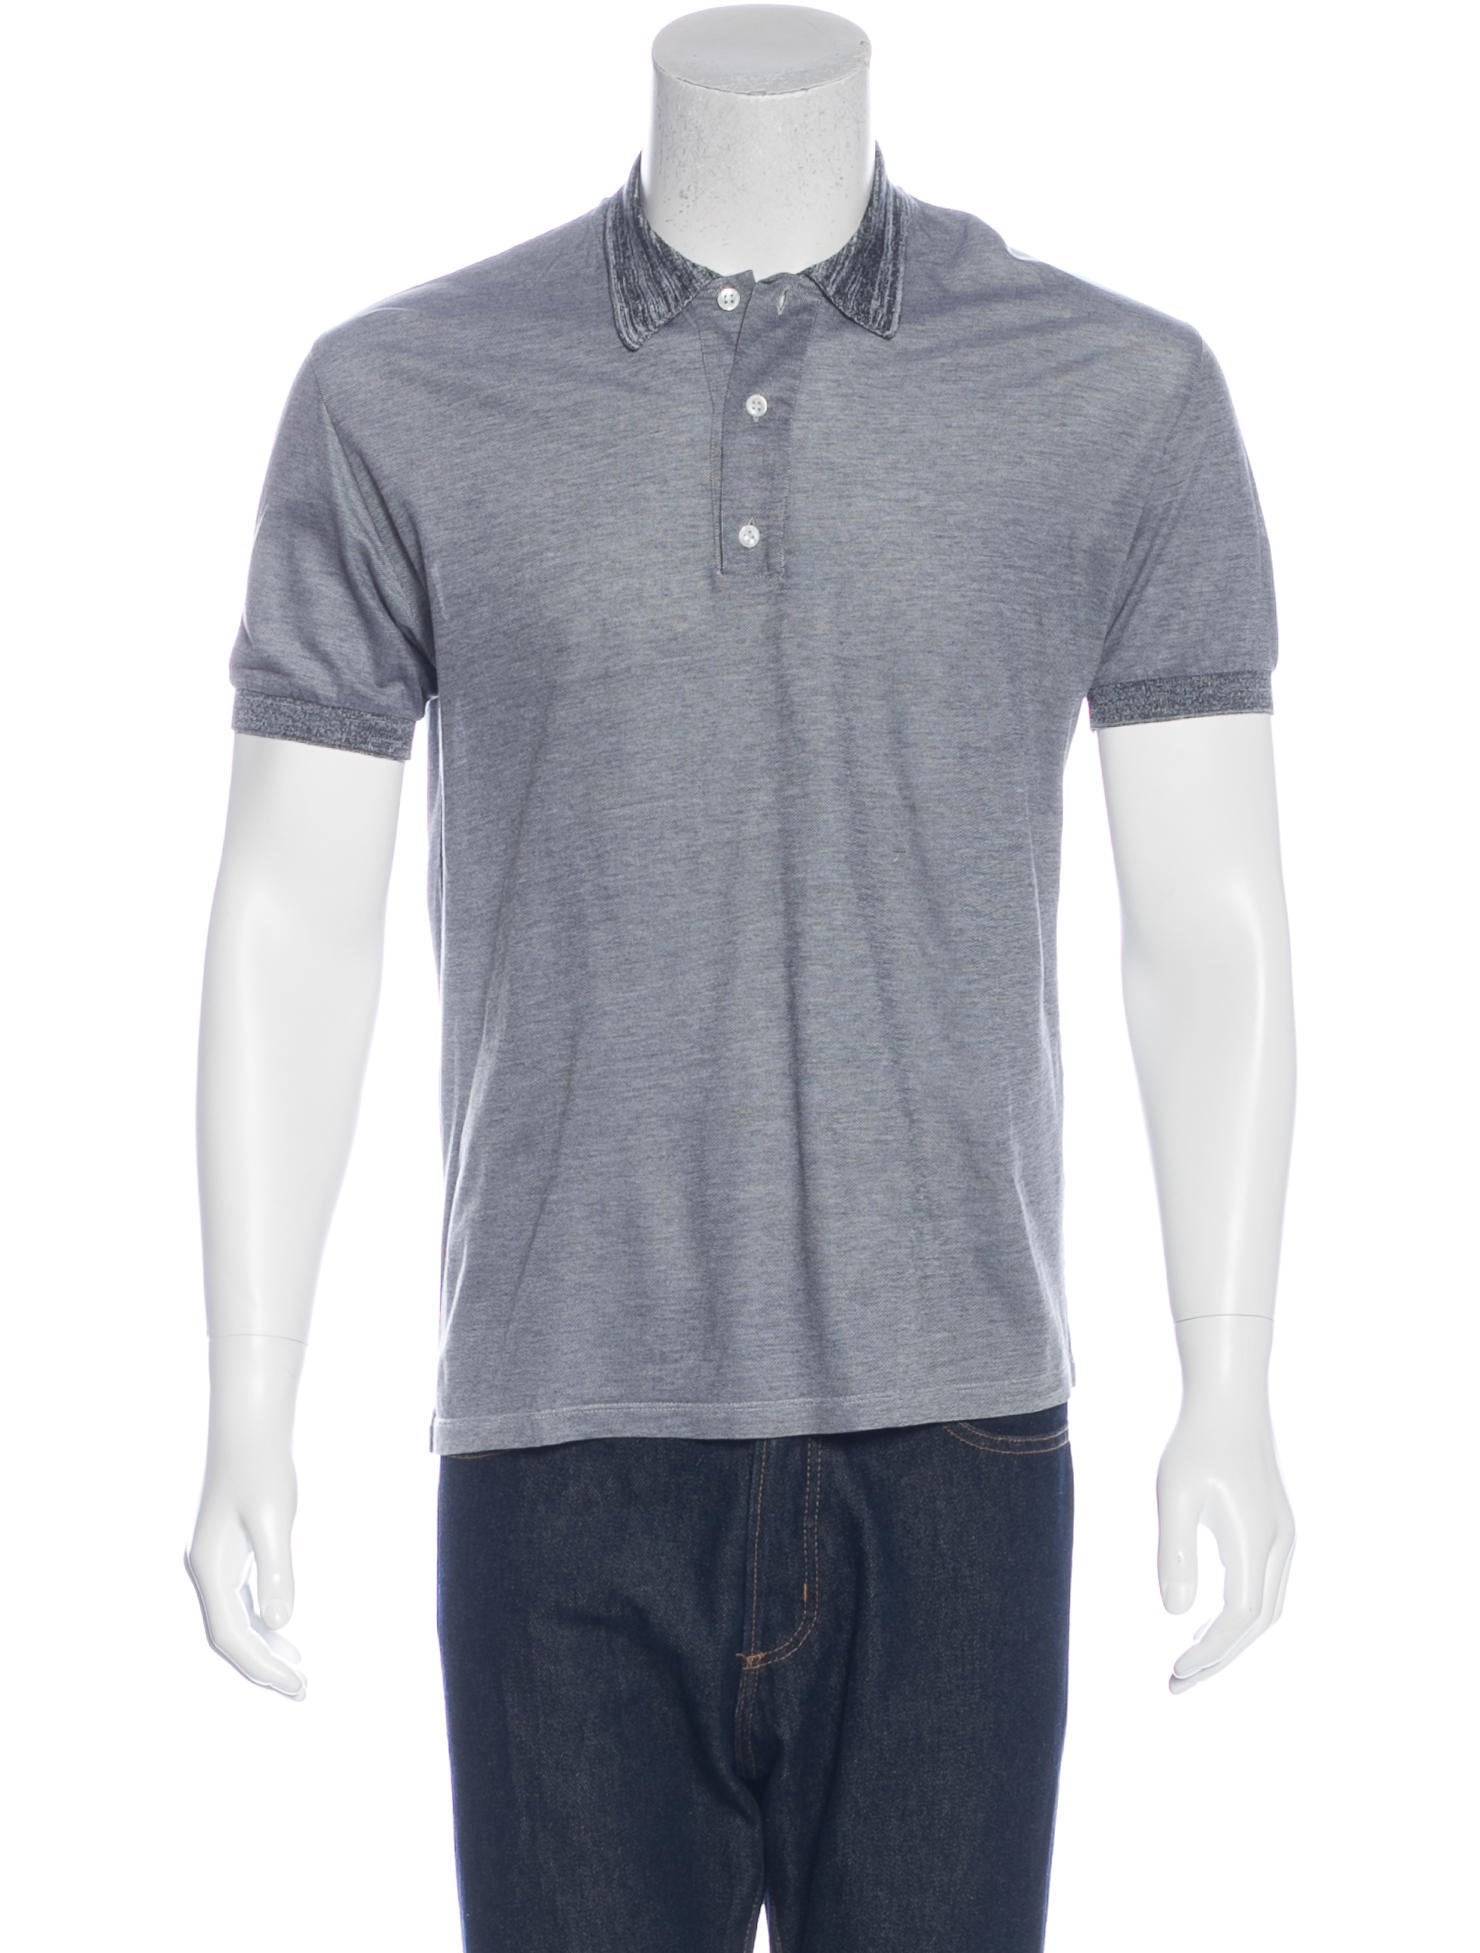 18e2fcaf8 Yves Saint Laurent Short Sleeve Polo Shirt - Clothing - YVE66803 | The  RealReal